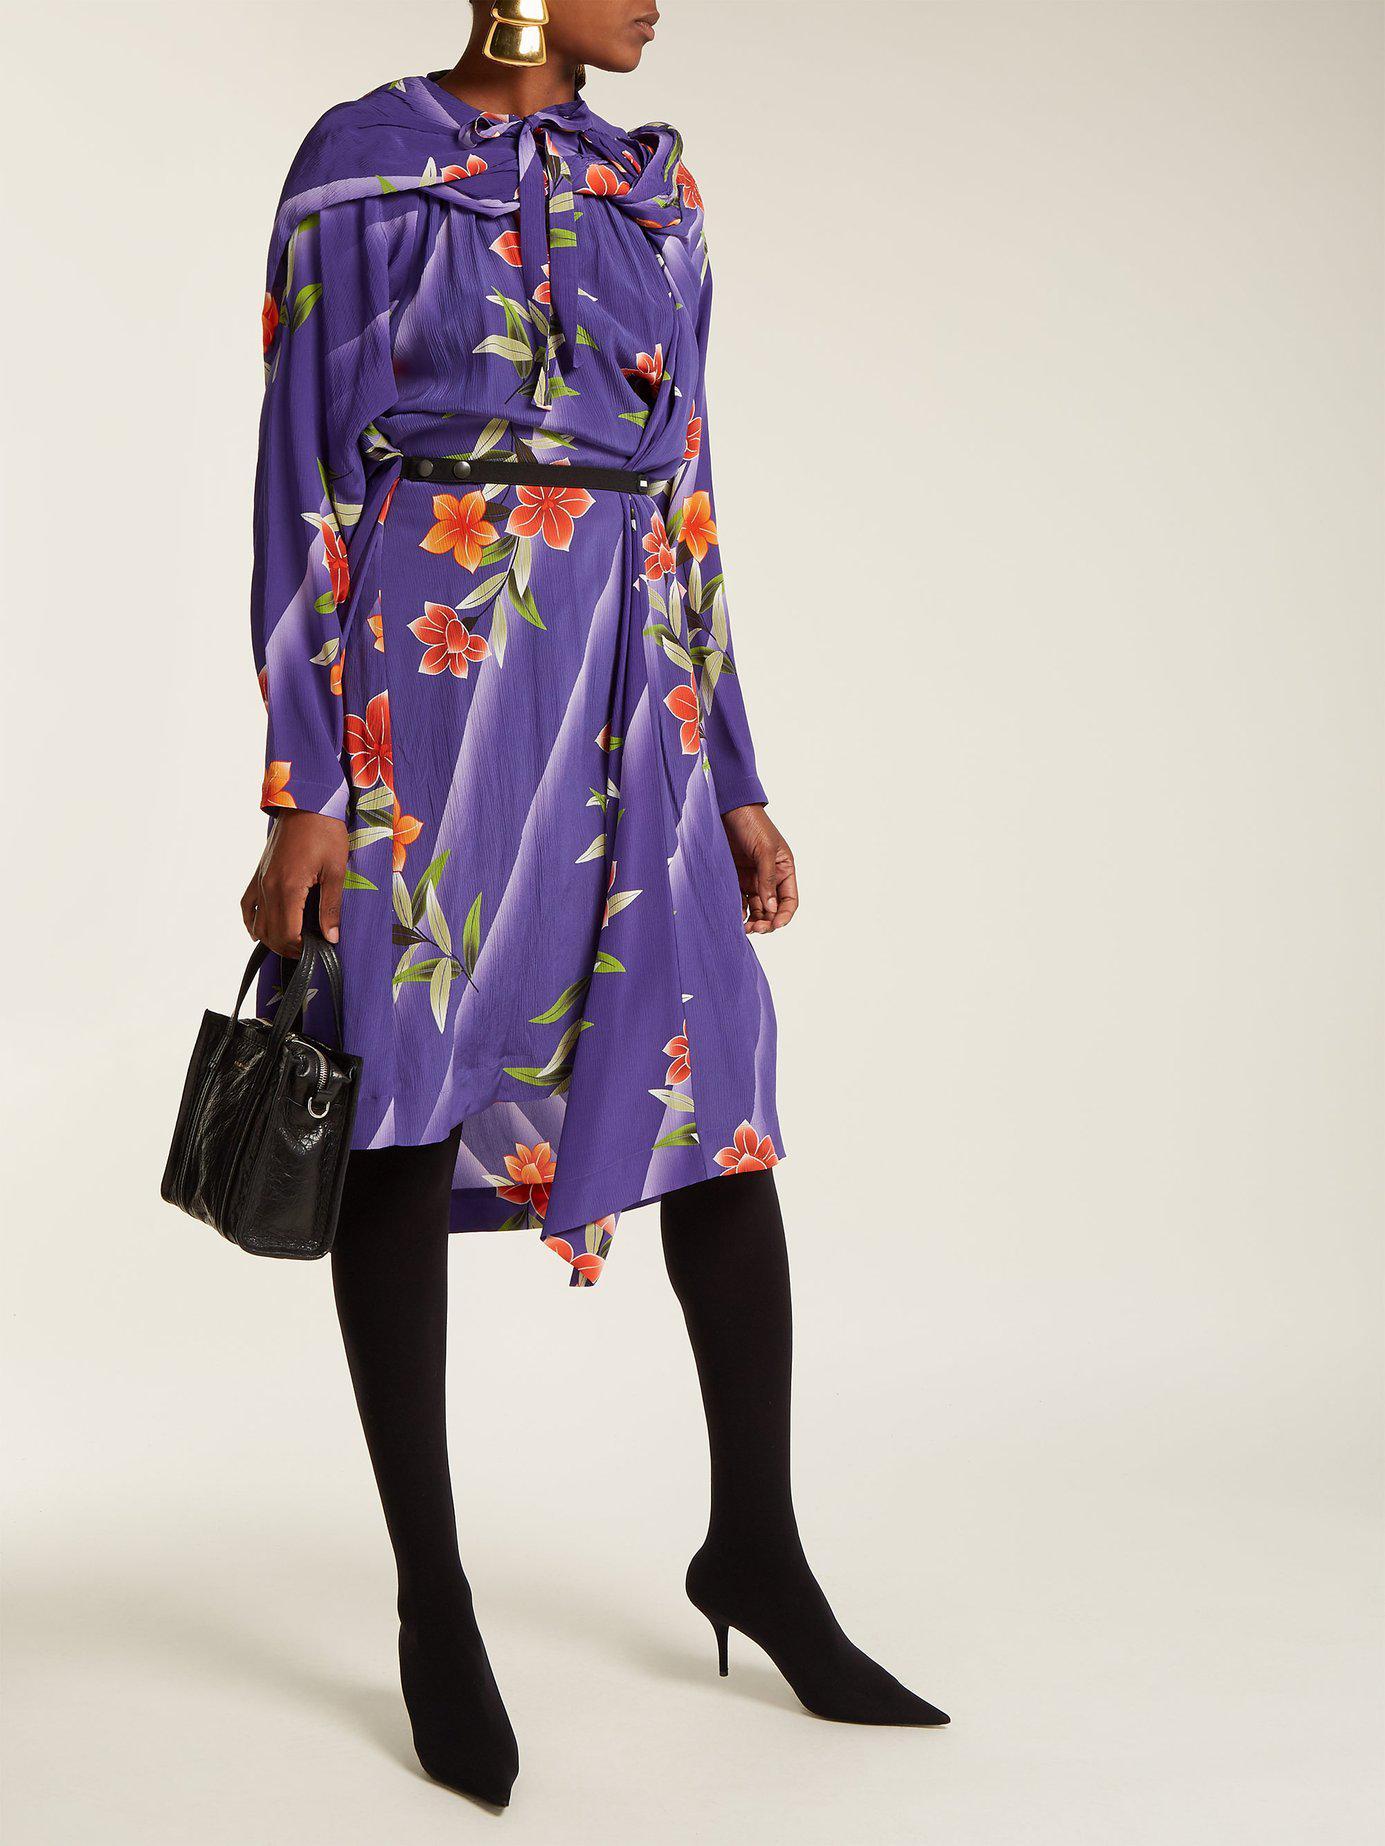 564f2a9cb65b Lyst - Balenciaga Floral Print Twisted Silk Dress in Purple